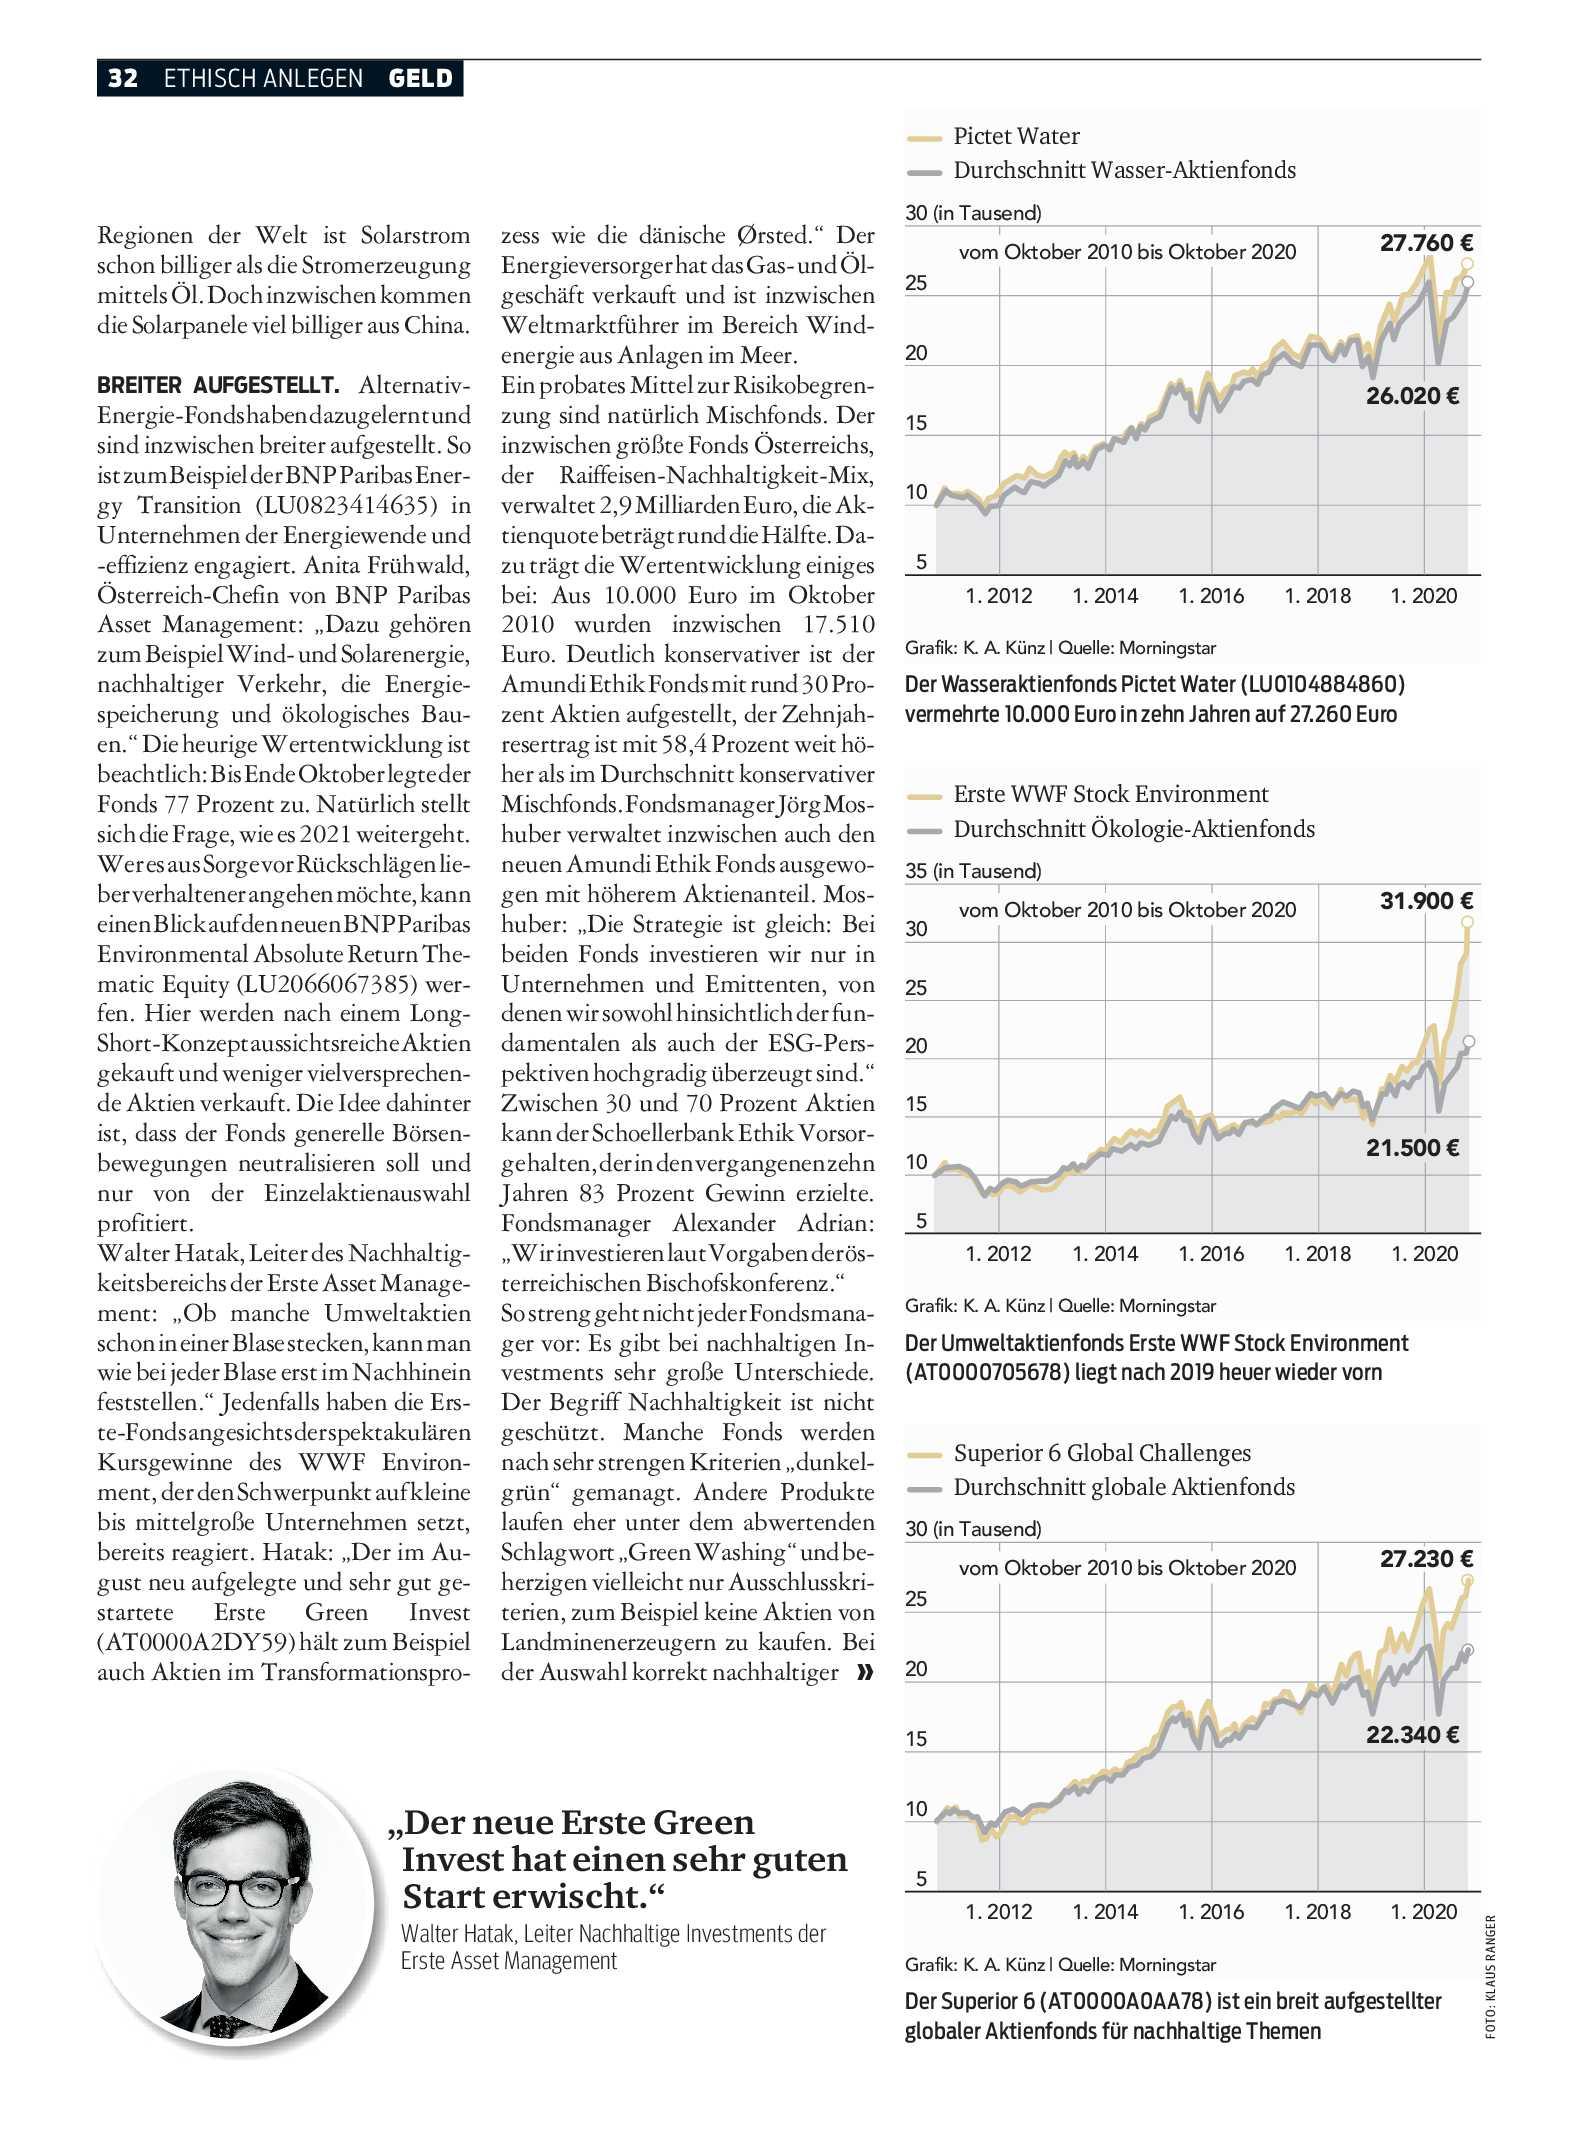 public/epaper/imported/20201118/kurier/magazin/magazin_20201118_032.jpg